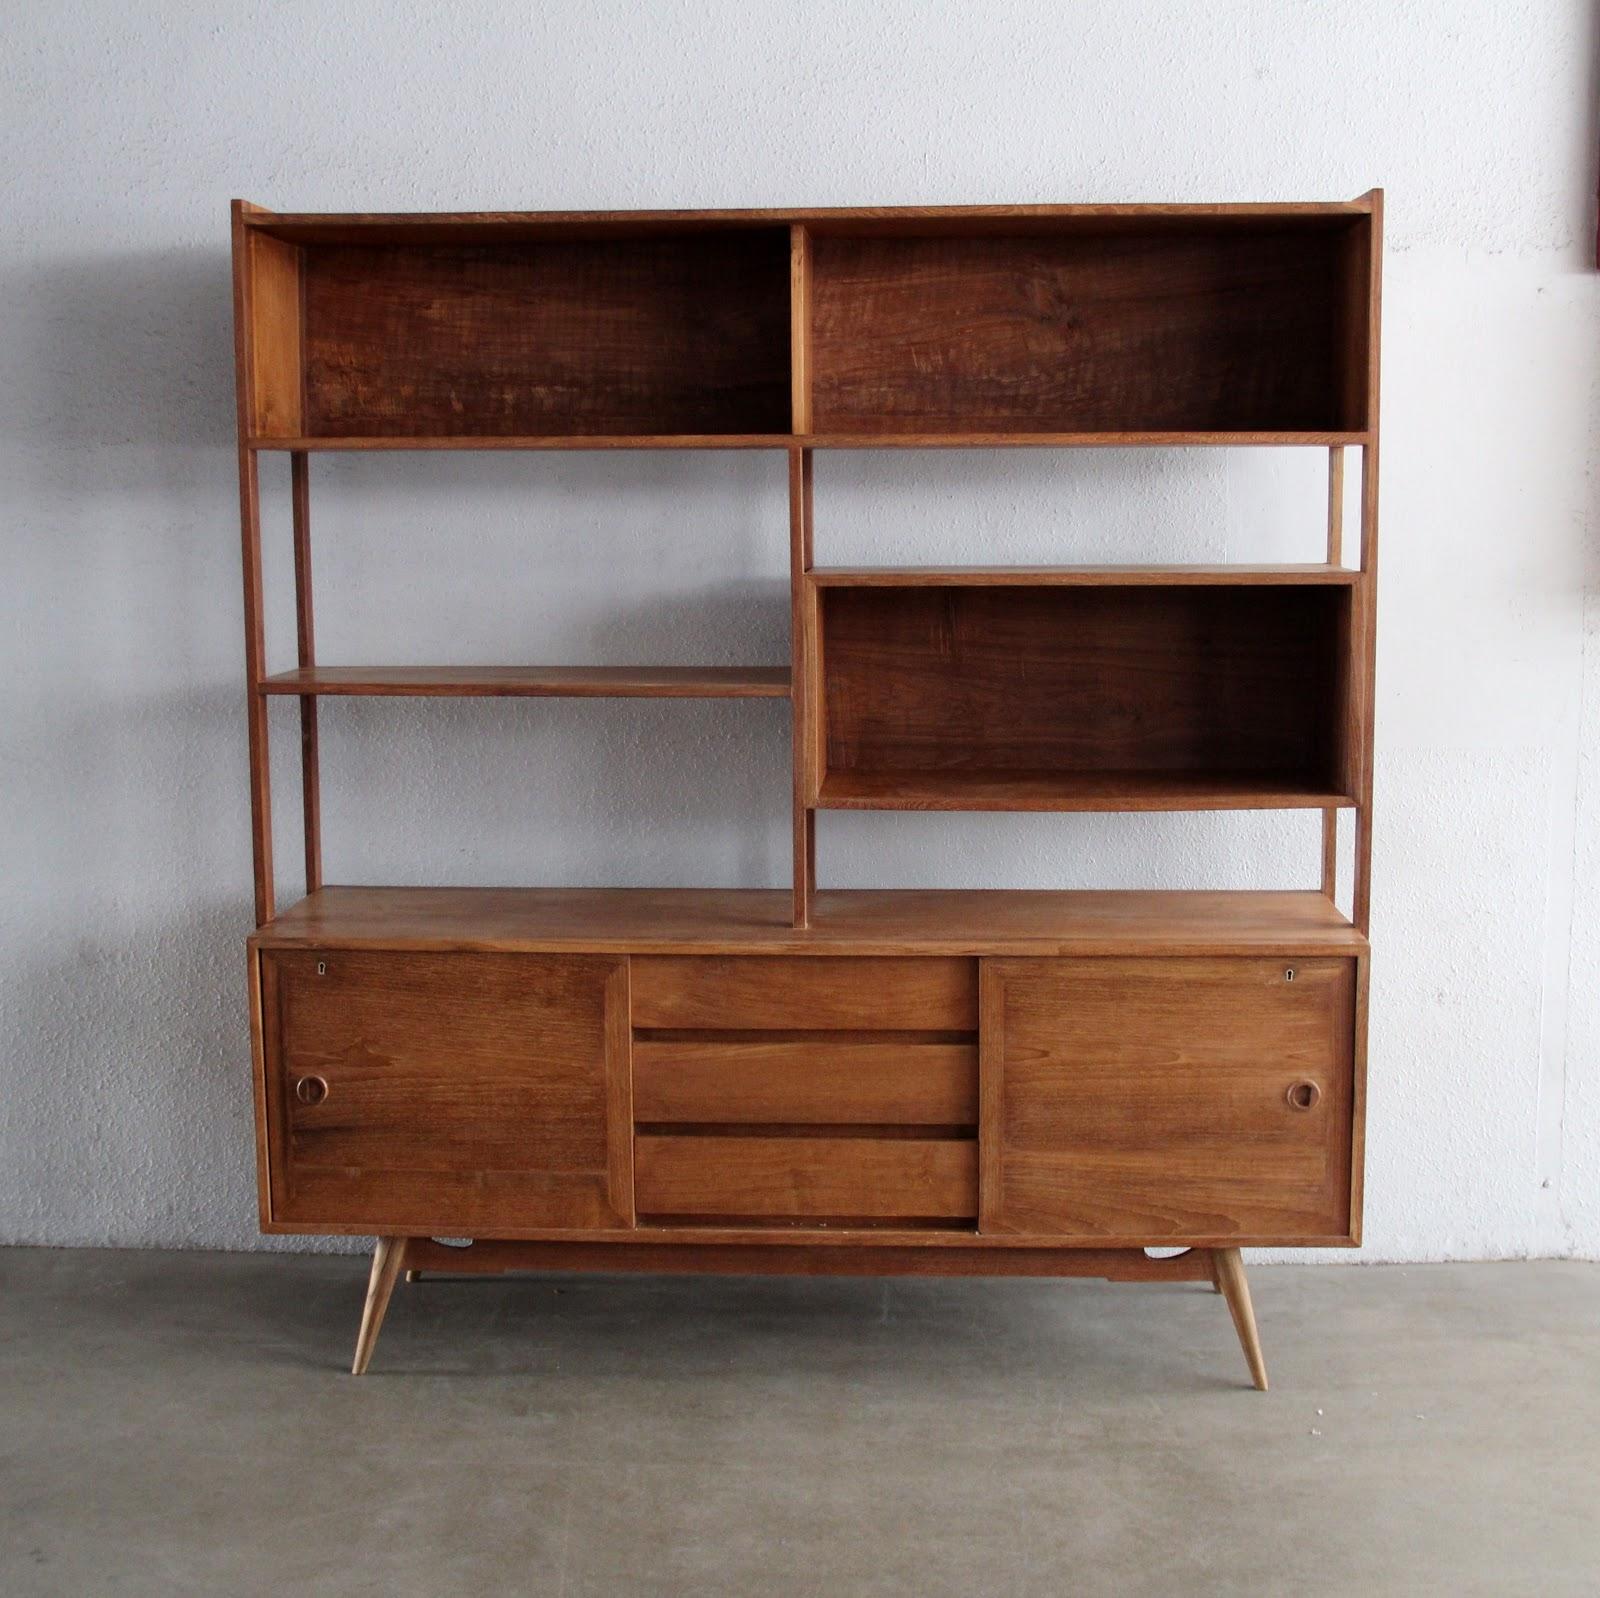 Vintage Display Cabinets 30